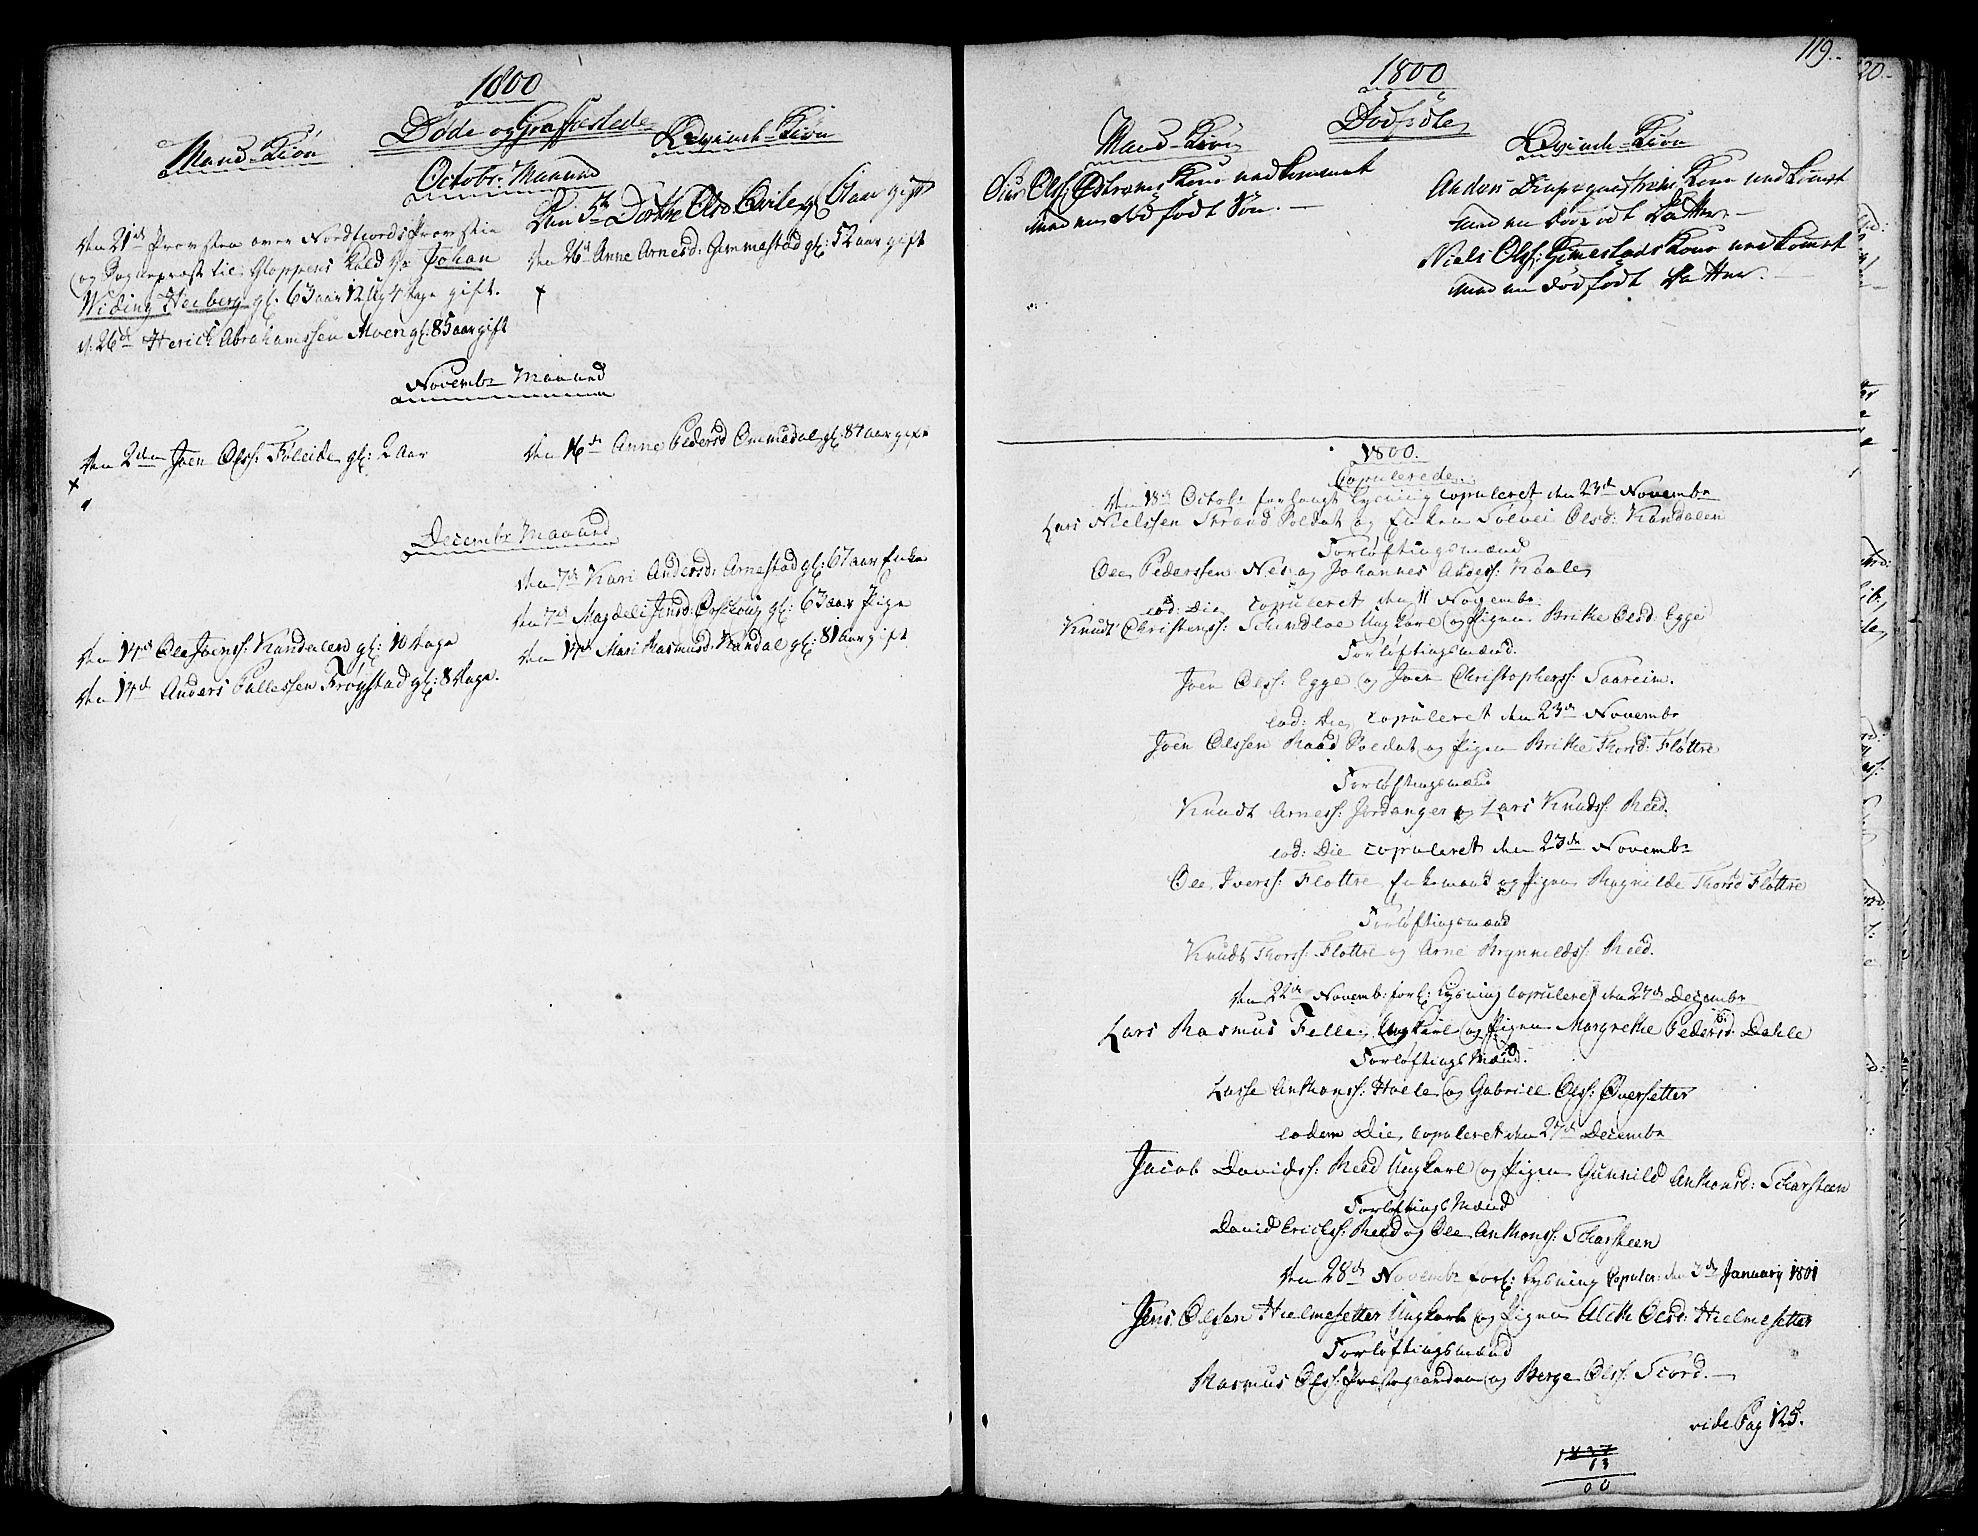 SAB, Gloppen sokneprestembete, H/Haa/Haaa/L0005: Ministerialbok nr. A 5, 1785-1815, s. 119